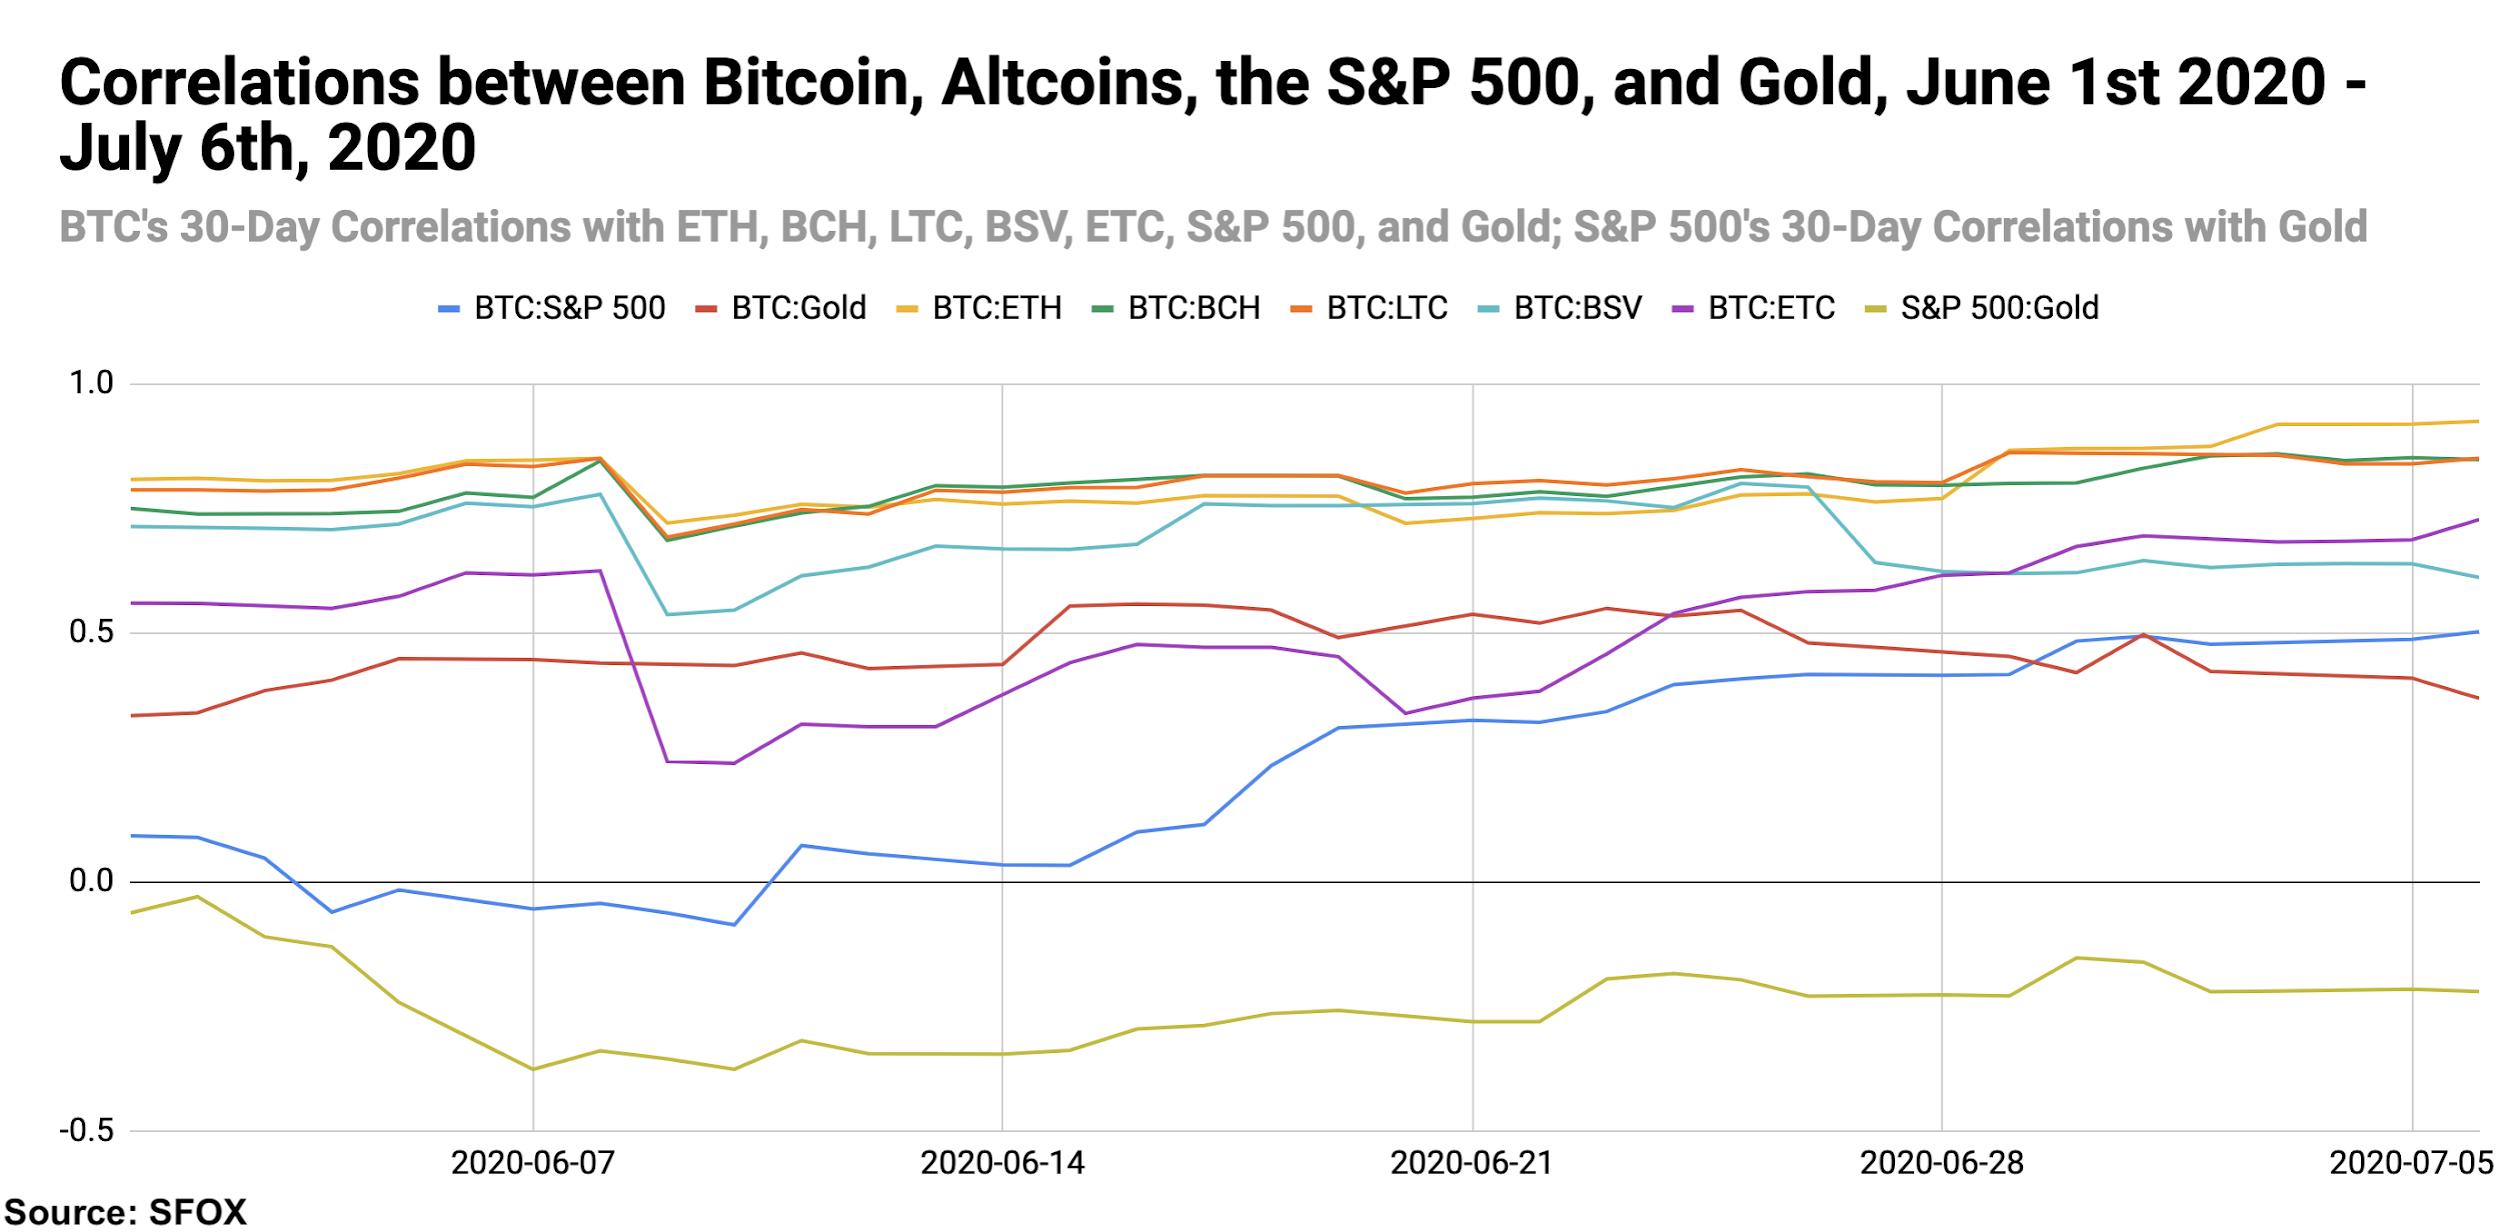 Bitcoin altcoin S&P 500 gold correlation chart July 2020.